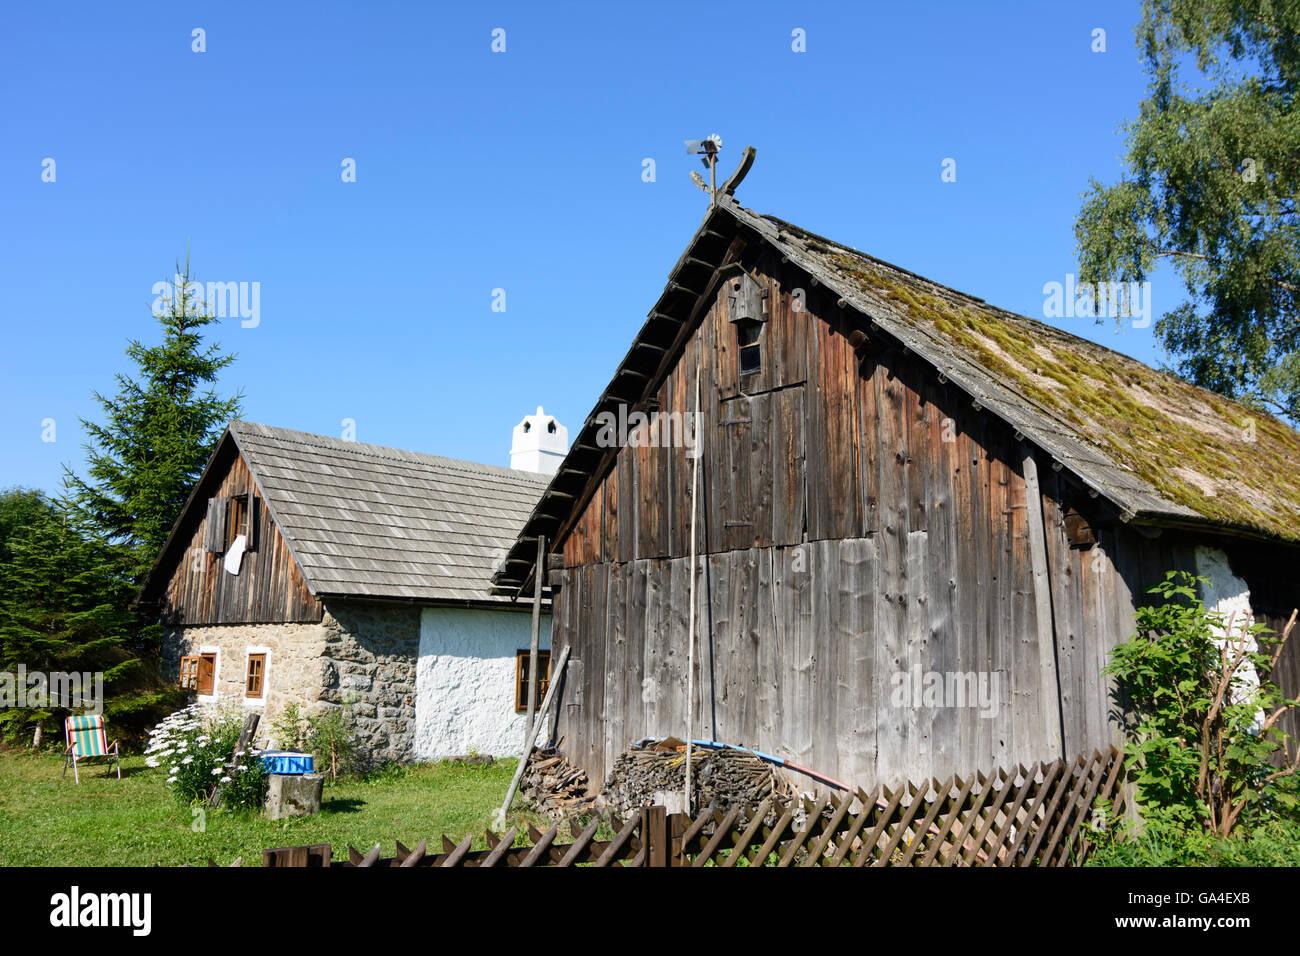 Altmelon old farmhouses Austria Niederösterreich, Lower Austria Waldviertel - Stock Image